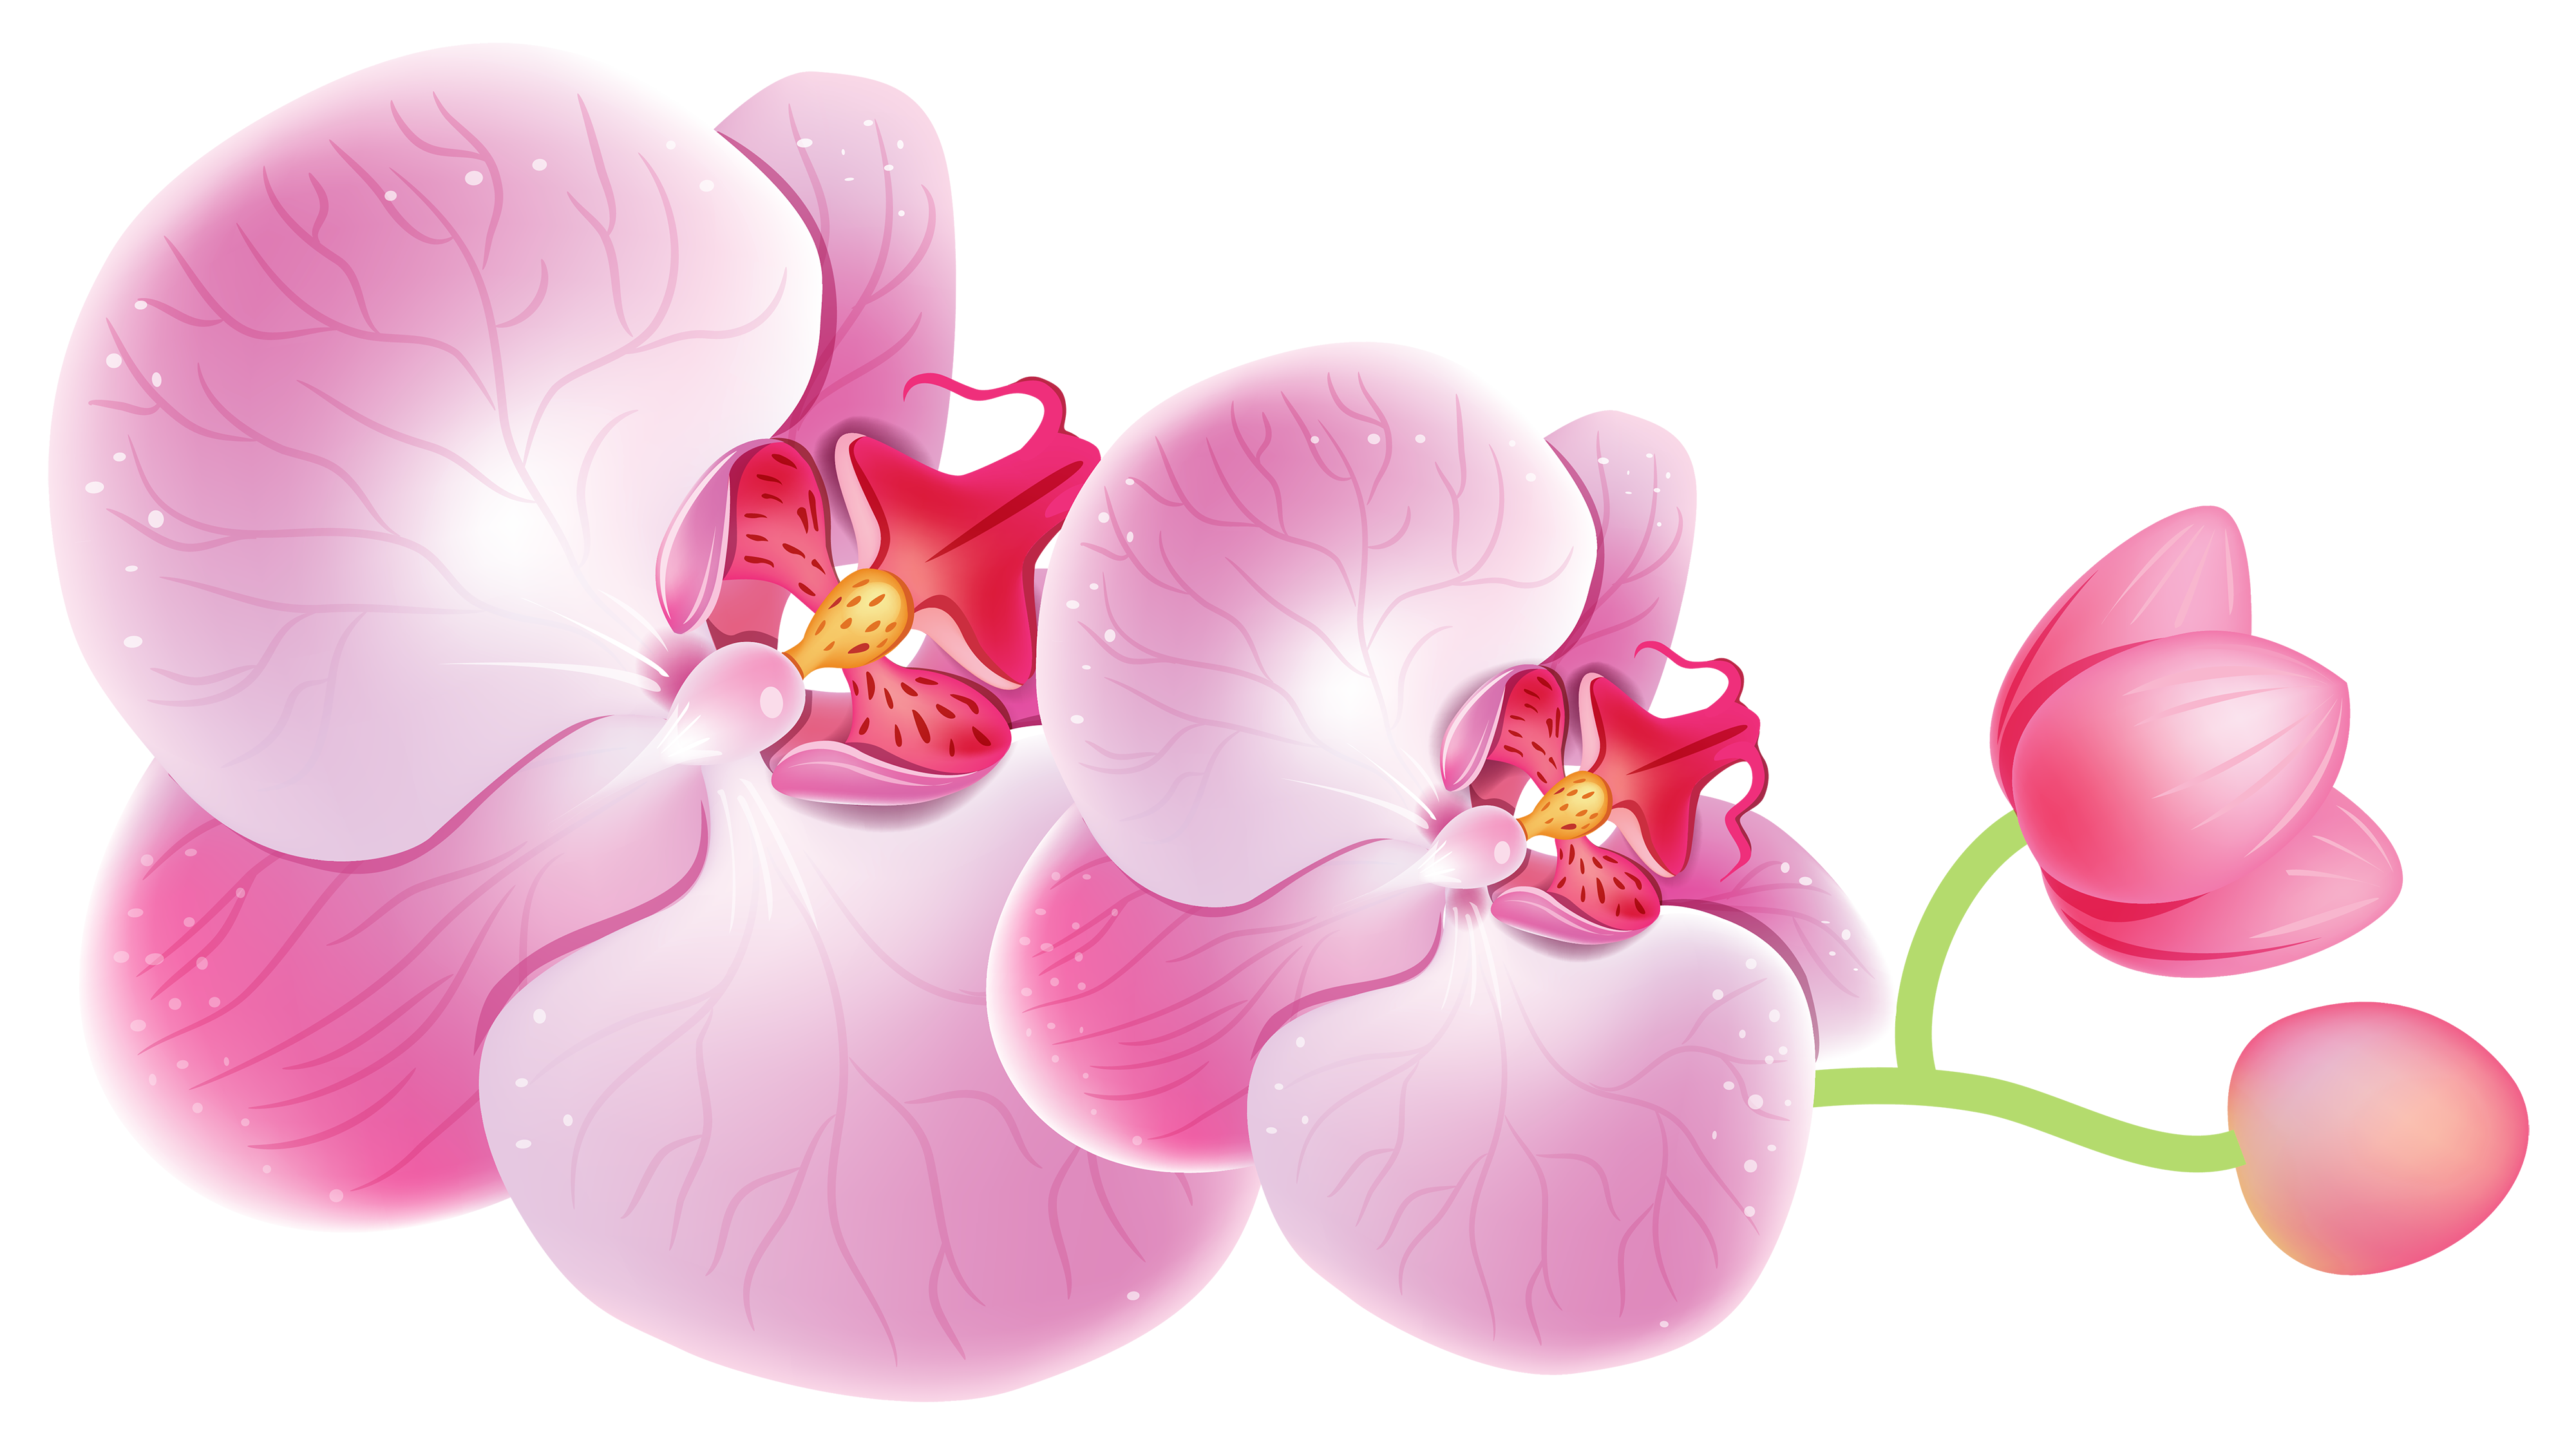 Orchid clipart. Orchids png best web